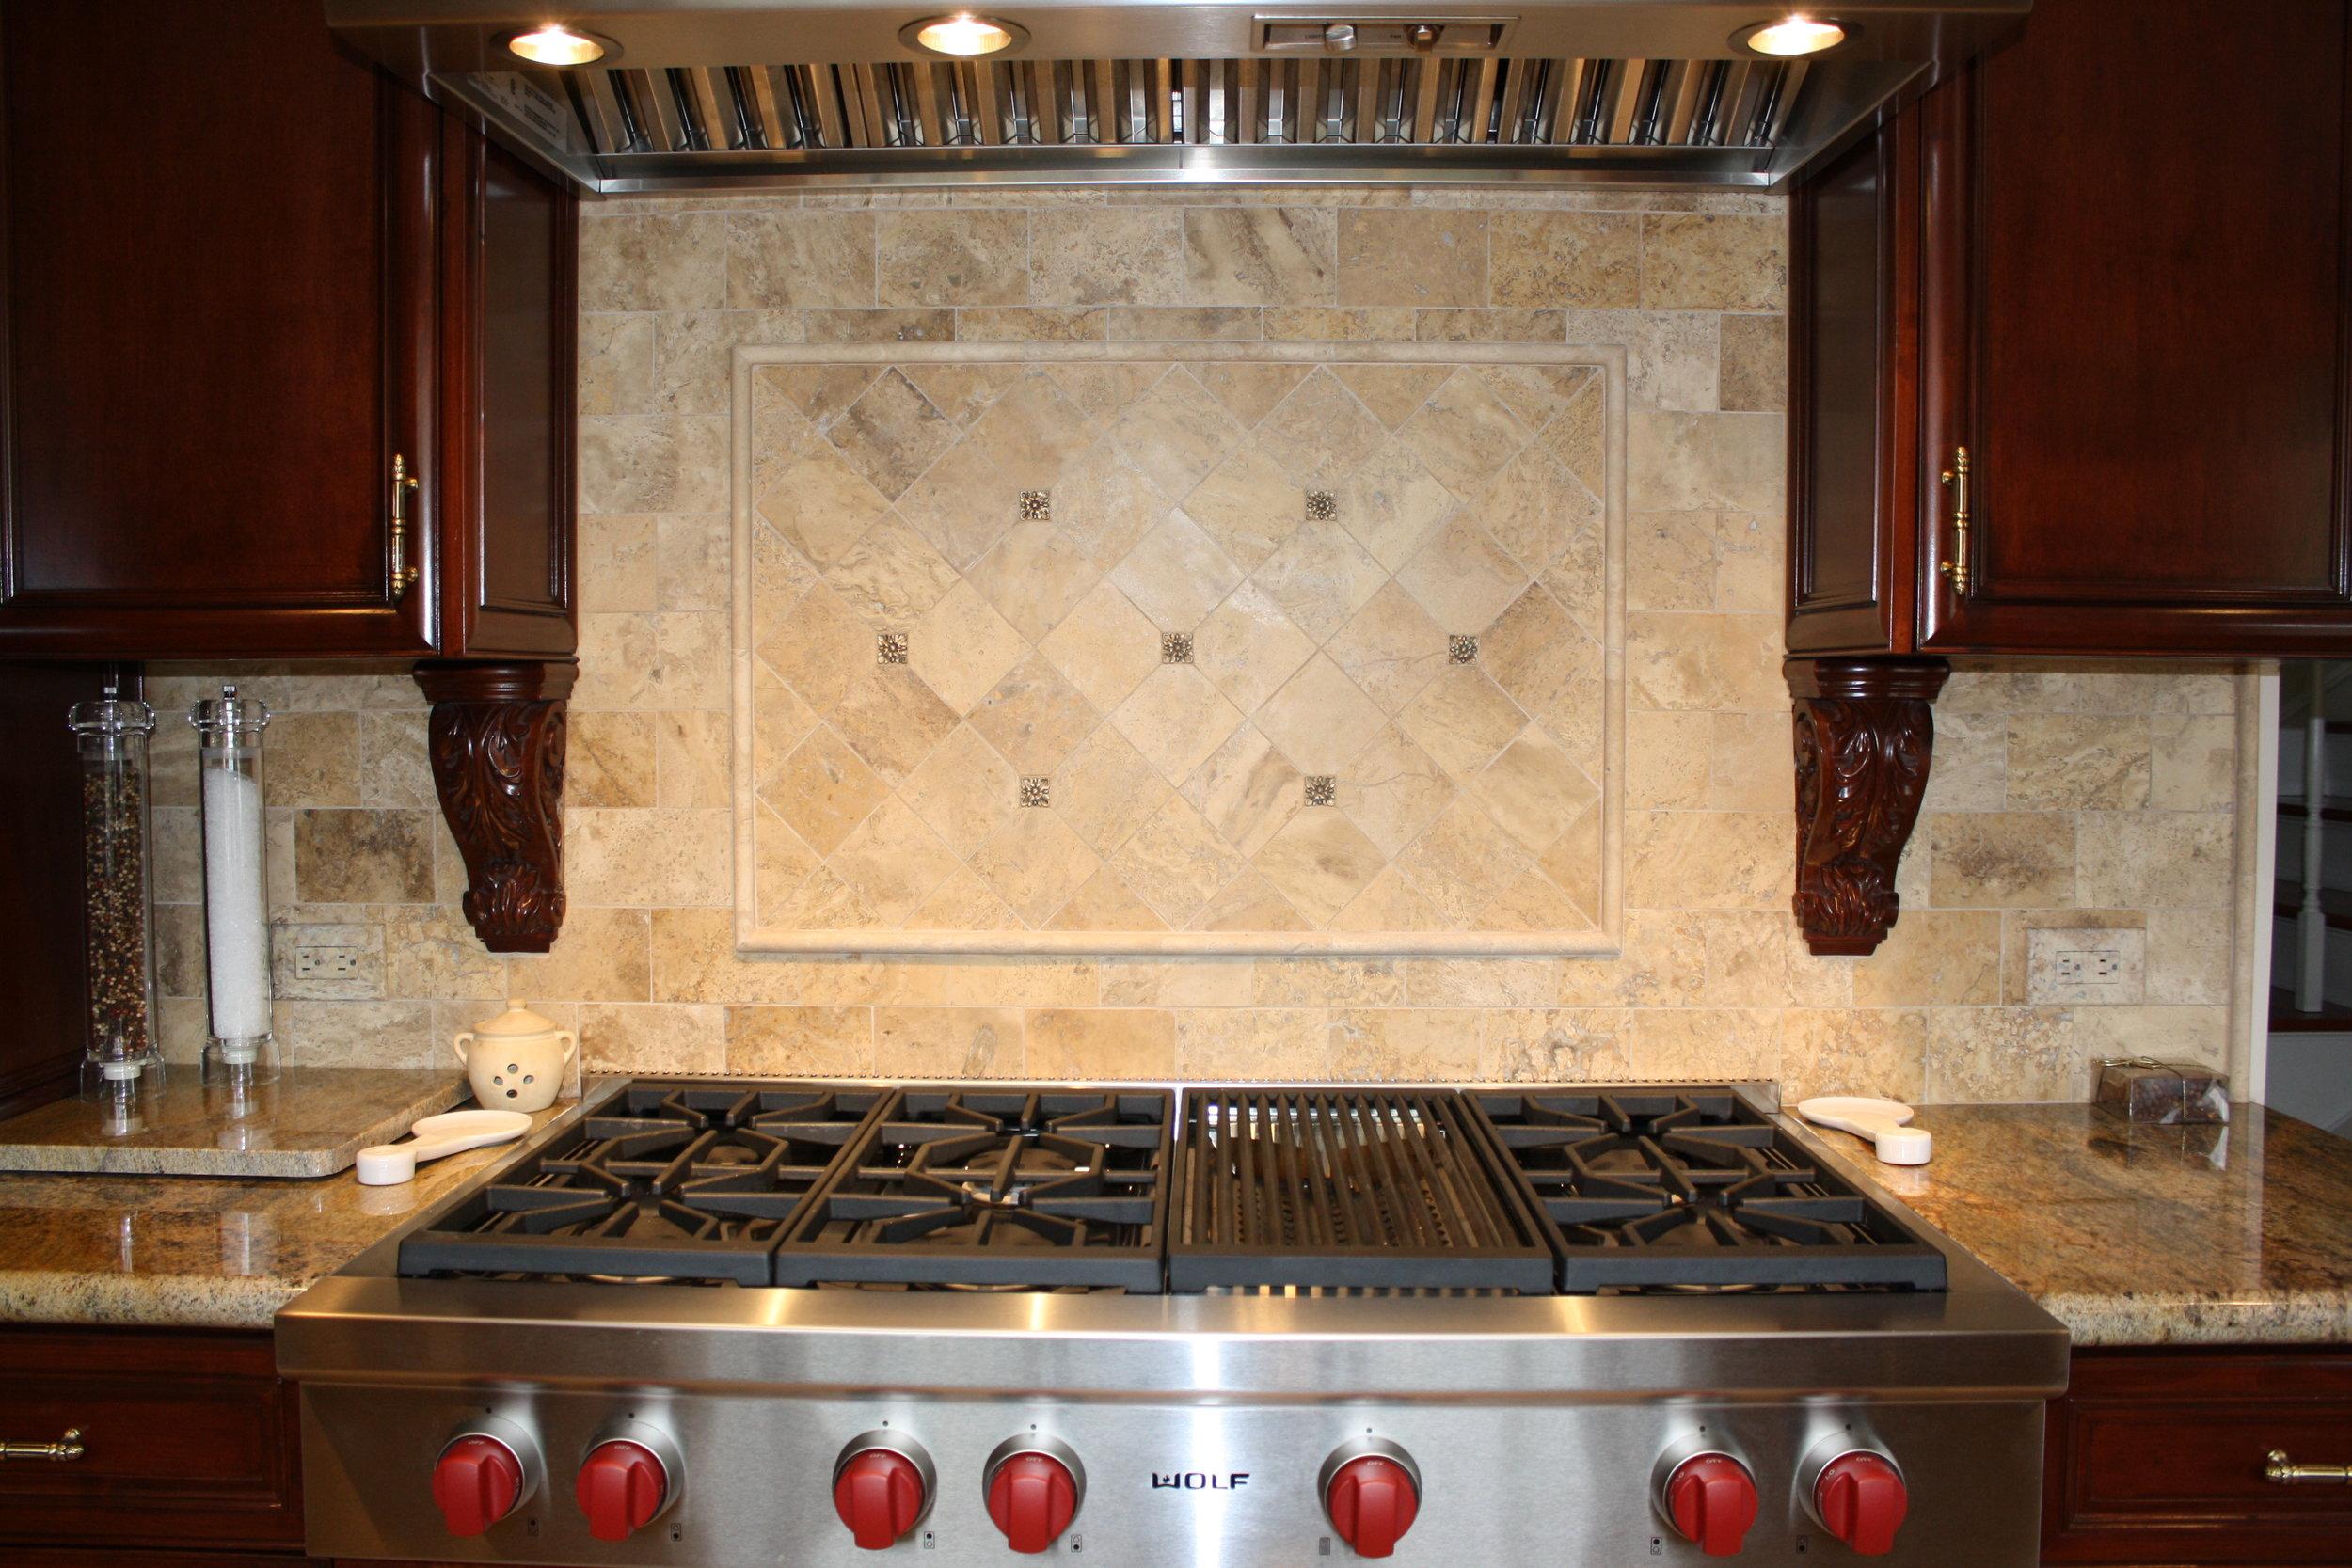 Wright Kitchen-Final, Sept_ 17, 09 023.jpg